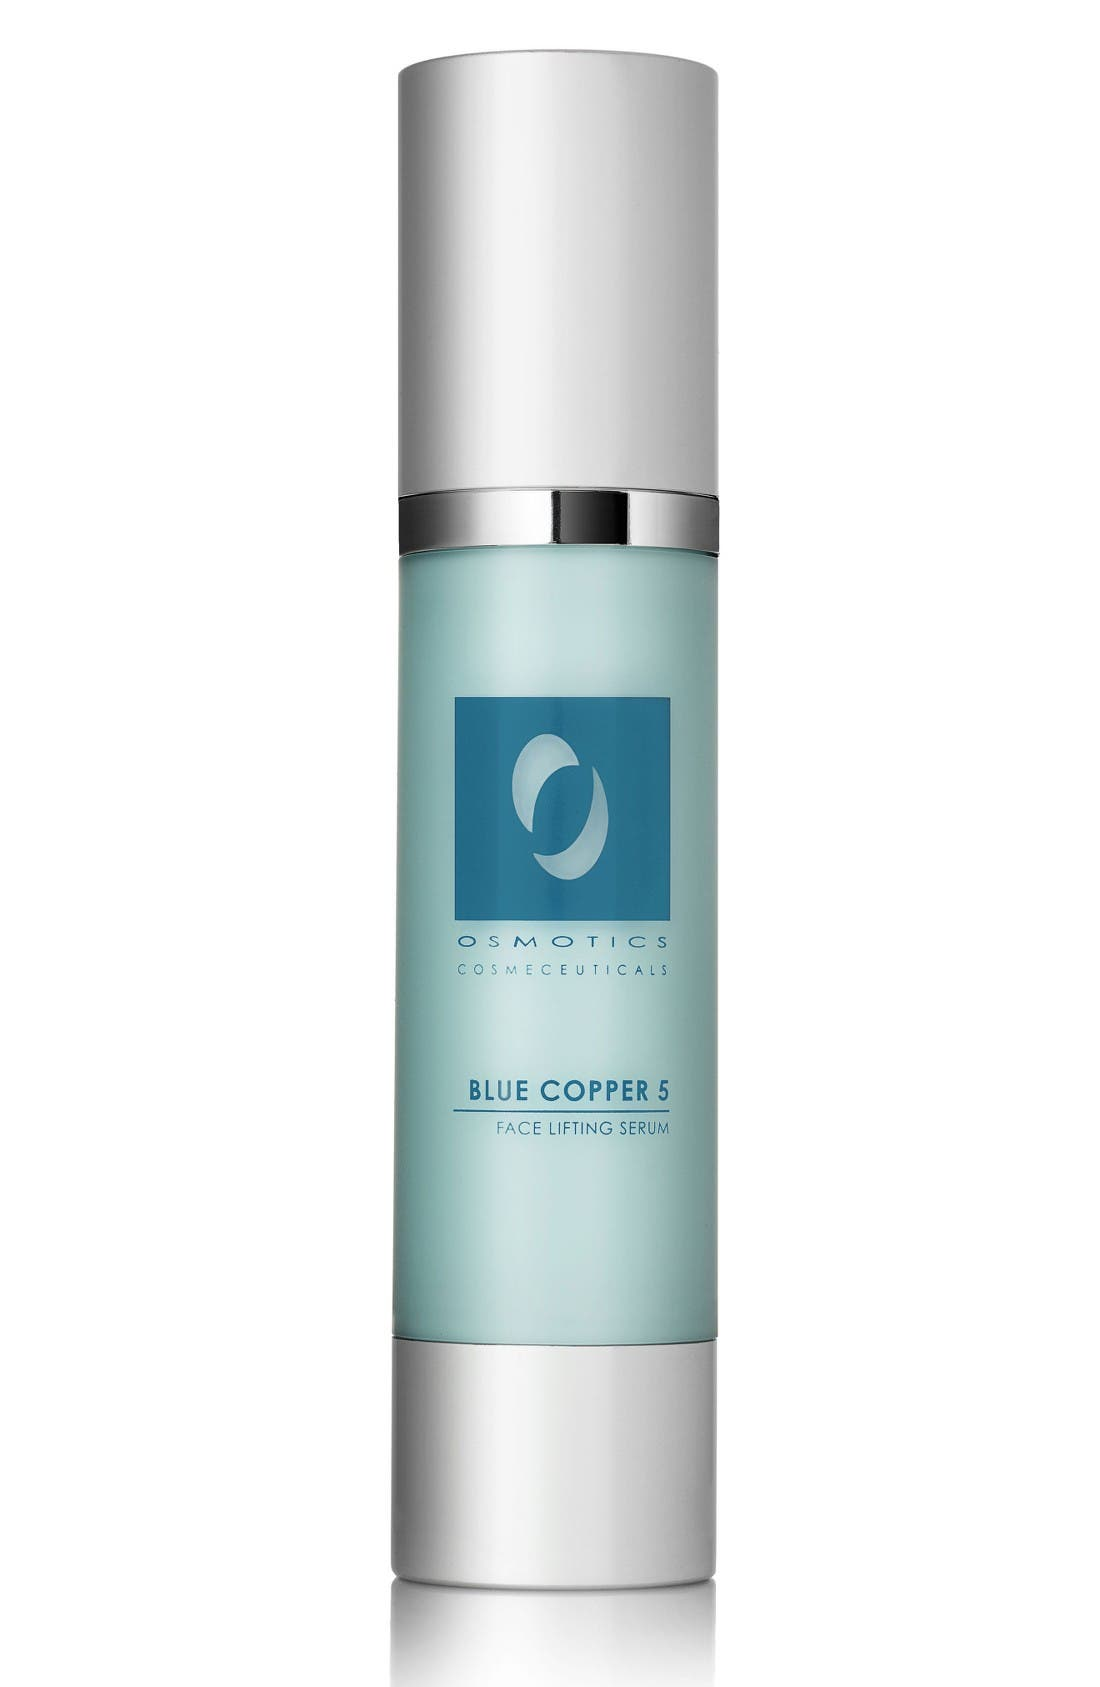 Osmotics Cosmeceuticals Blue Copper 5 Face Lifting Serum